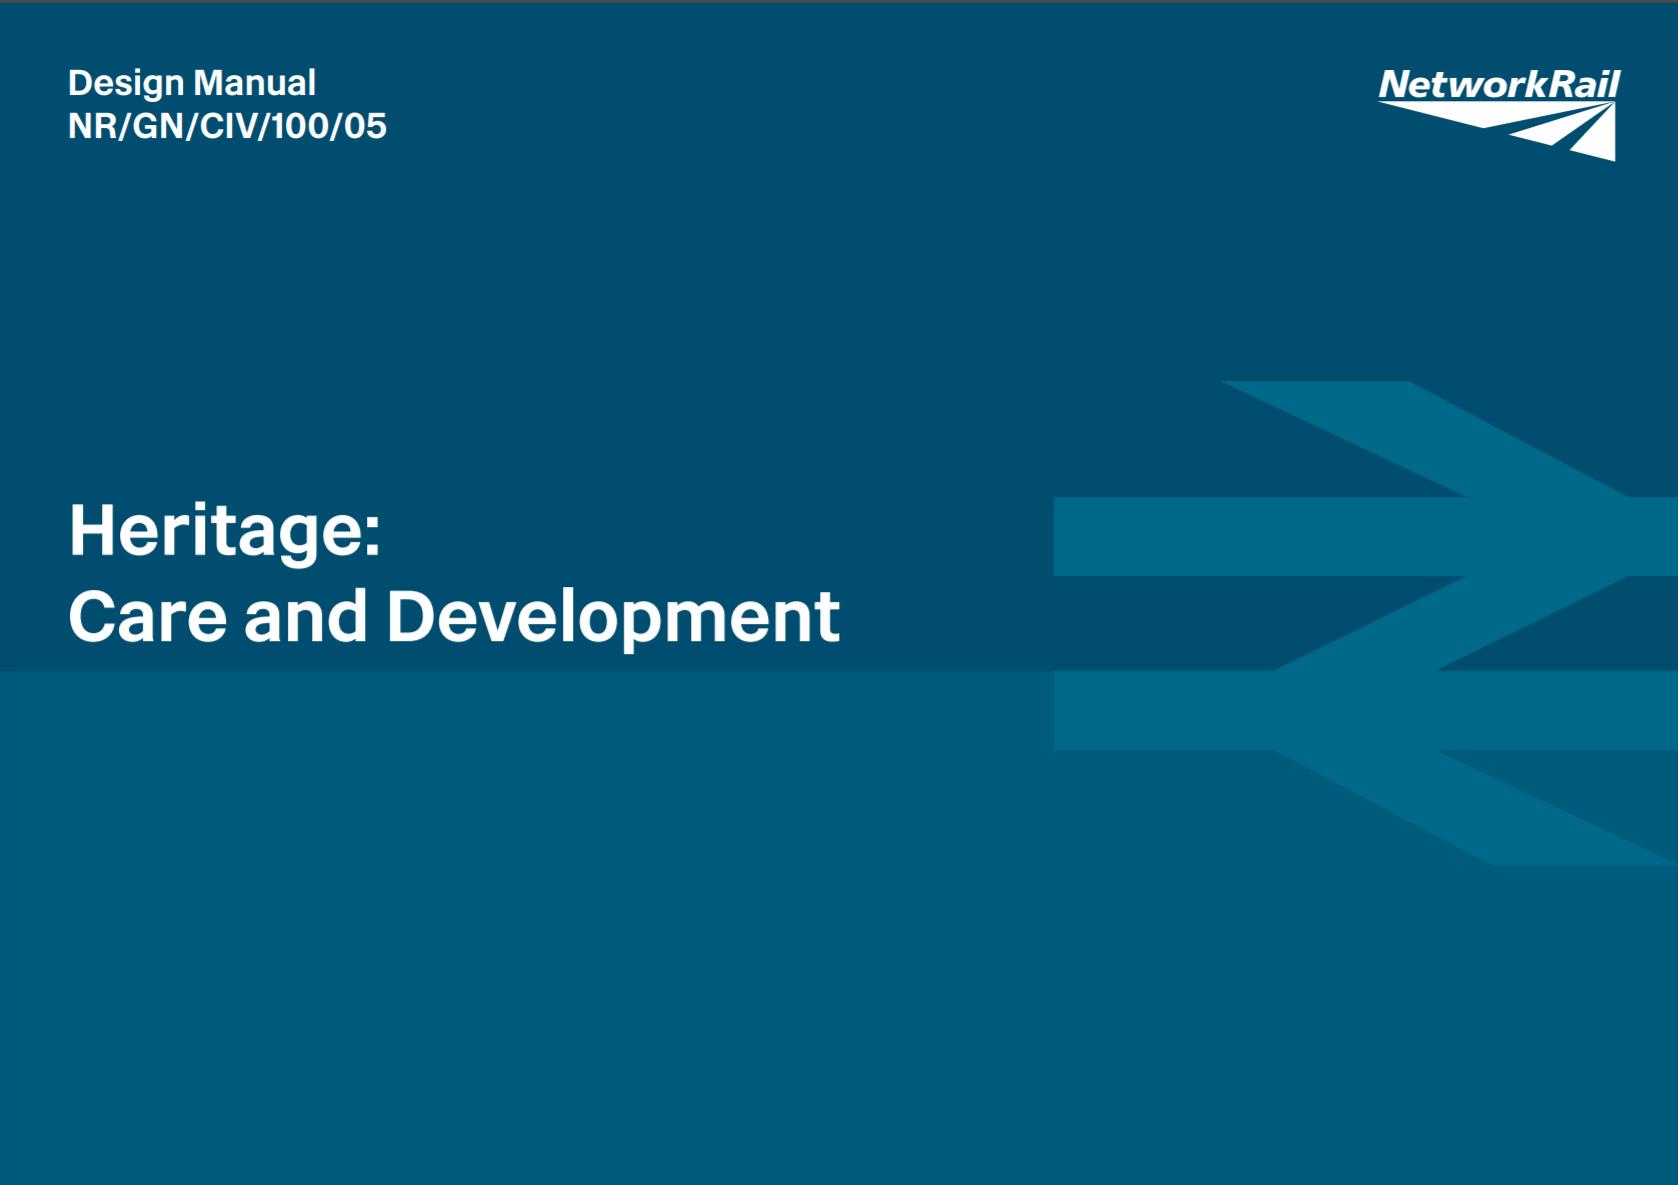 Heritage: Care and Development